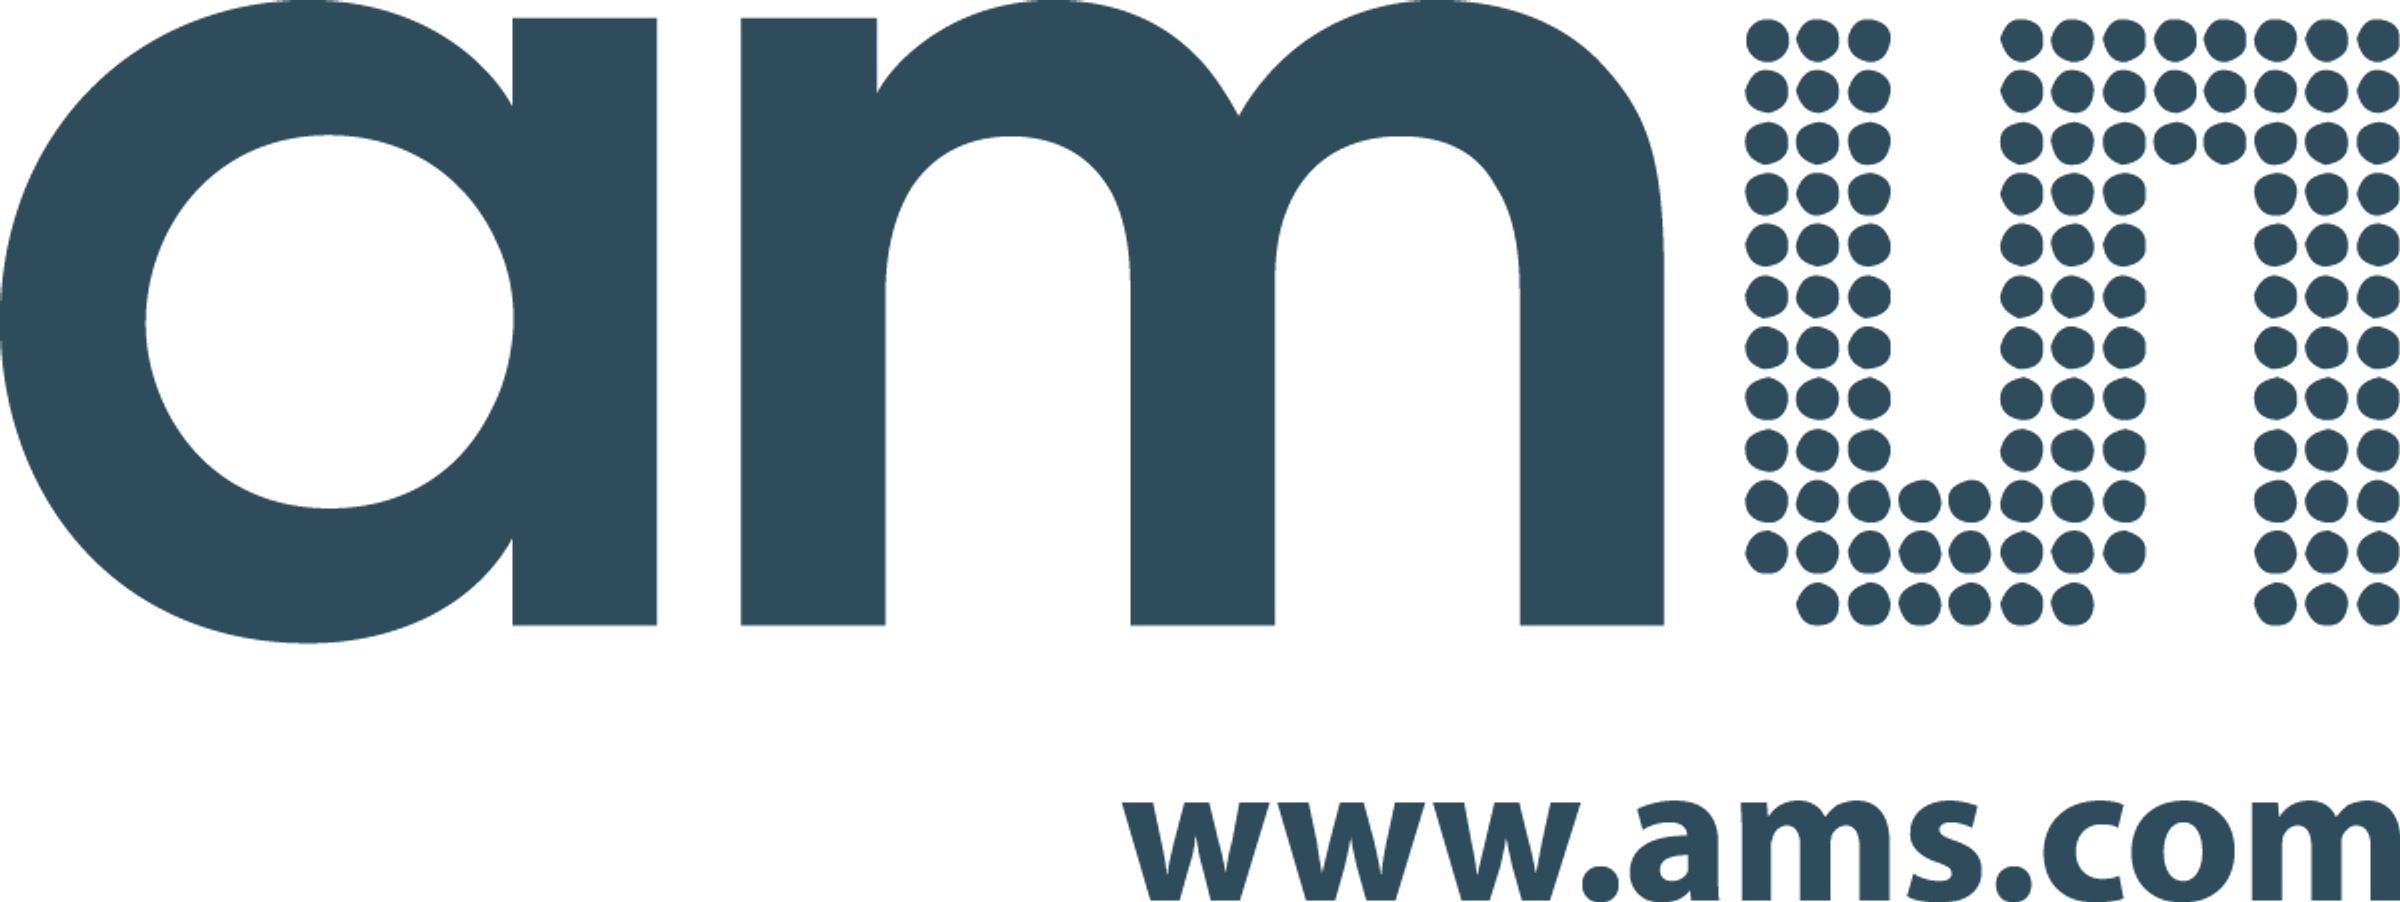 ams_logo_url_cmyk